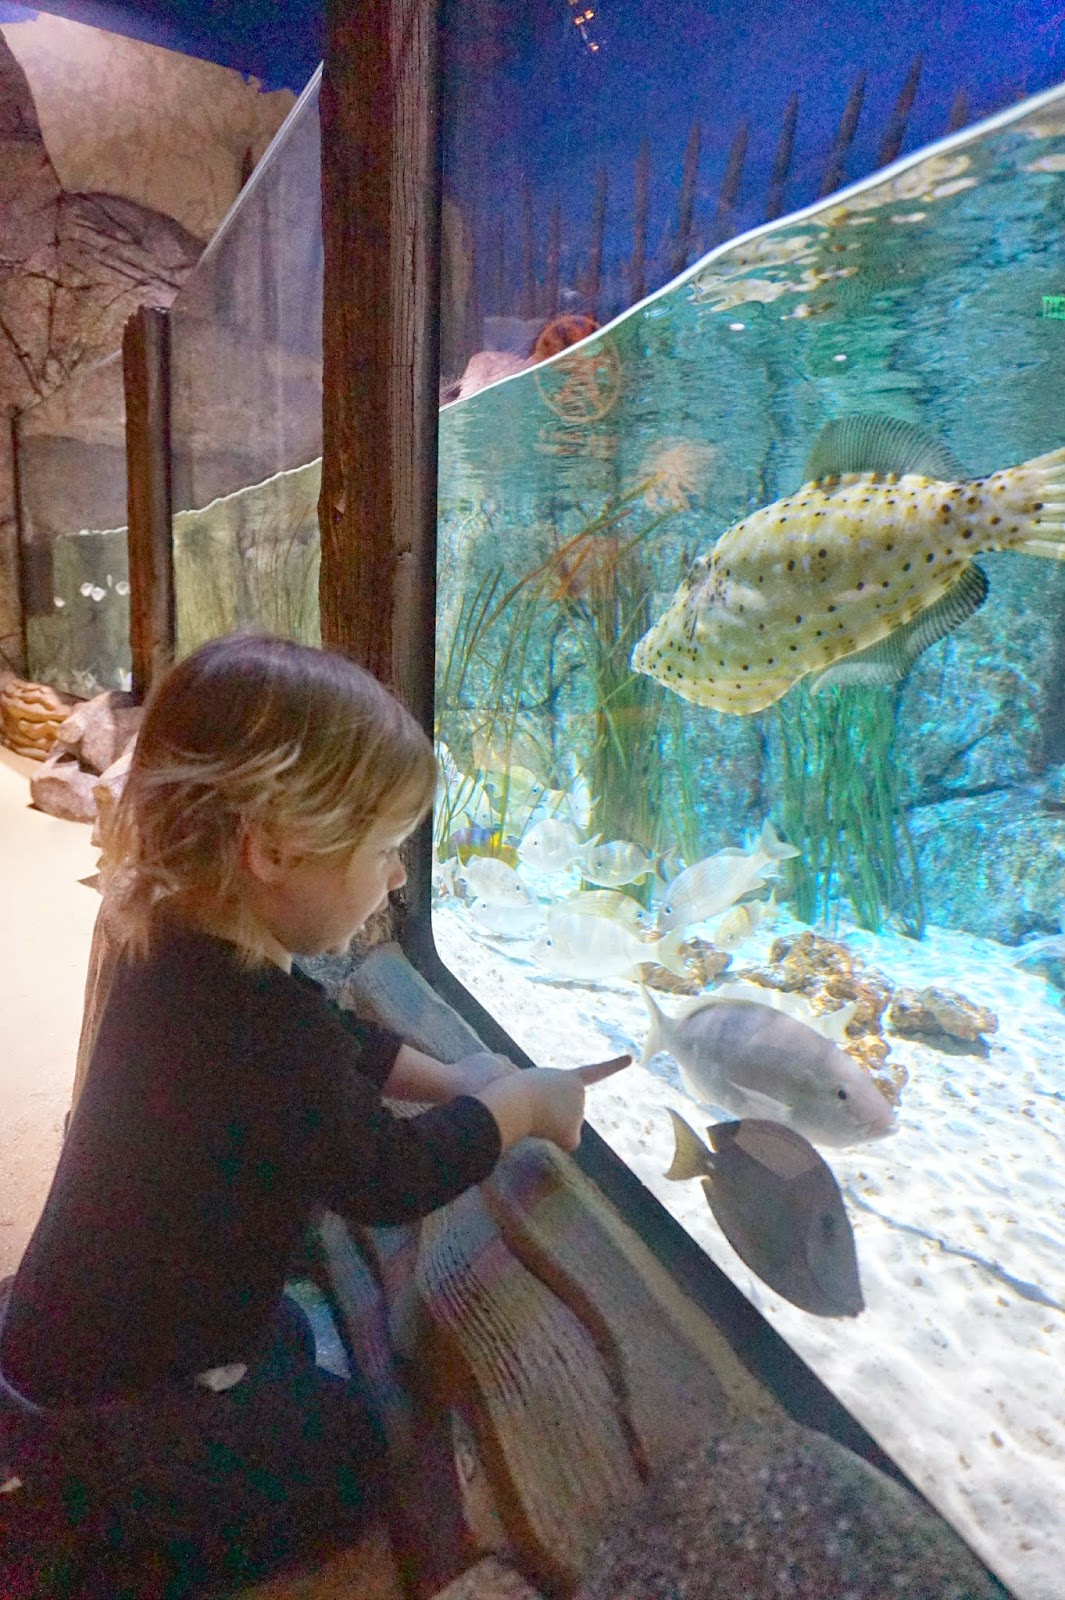 5 places for family fun in charlotte north carolina Concord mills mall aquarium